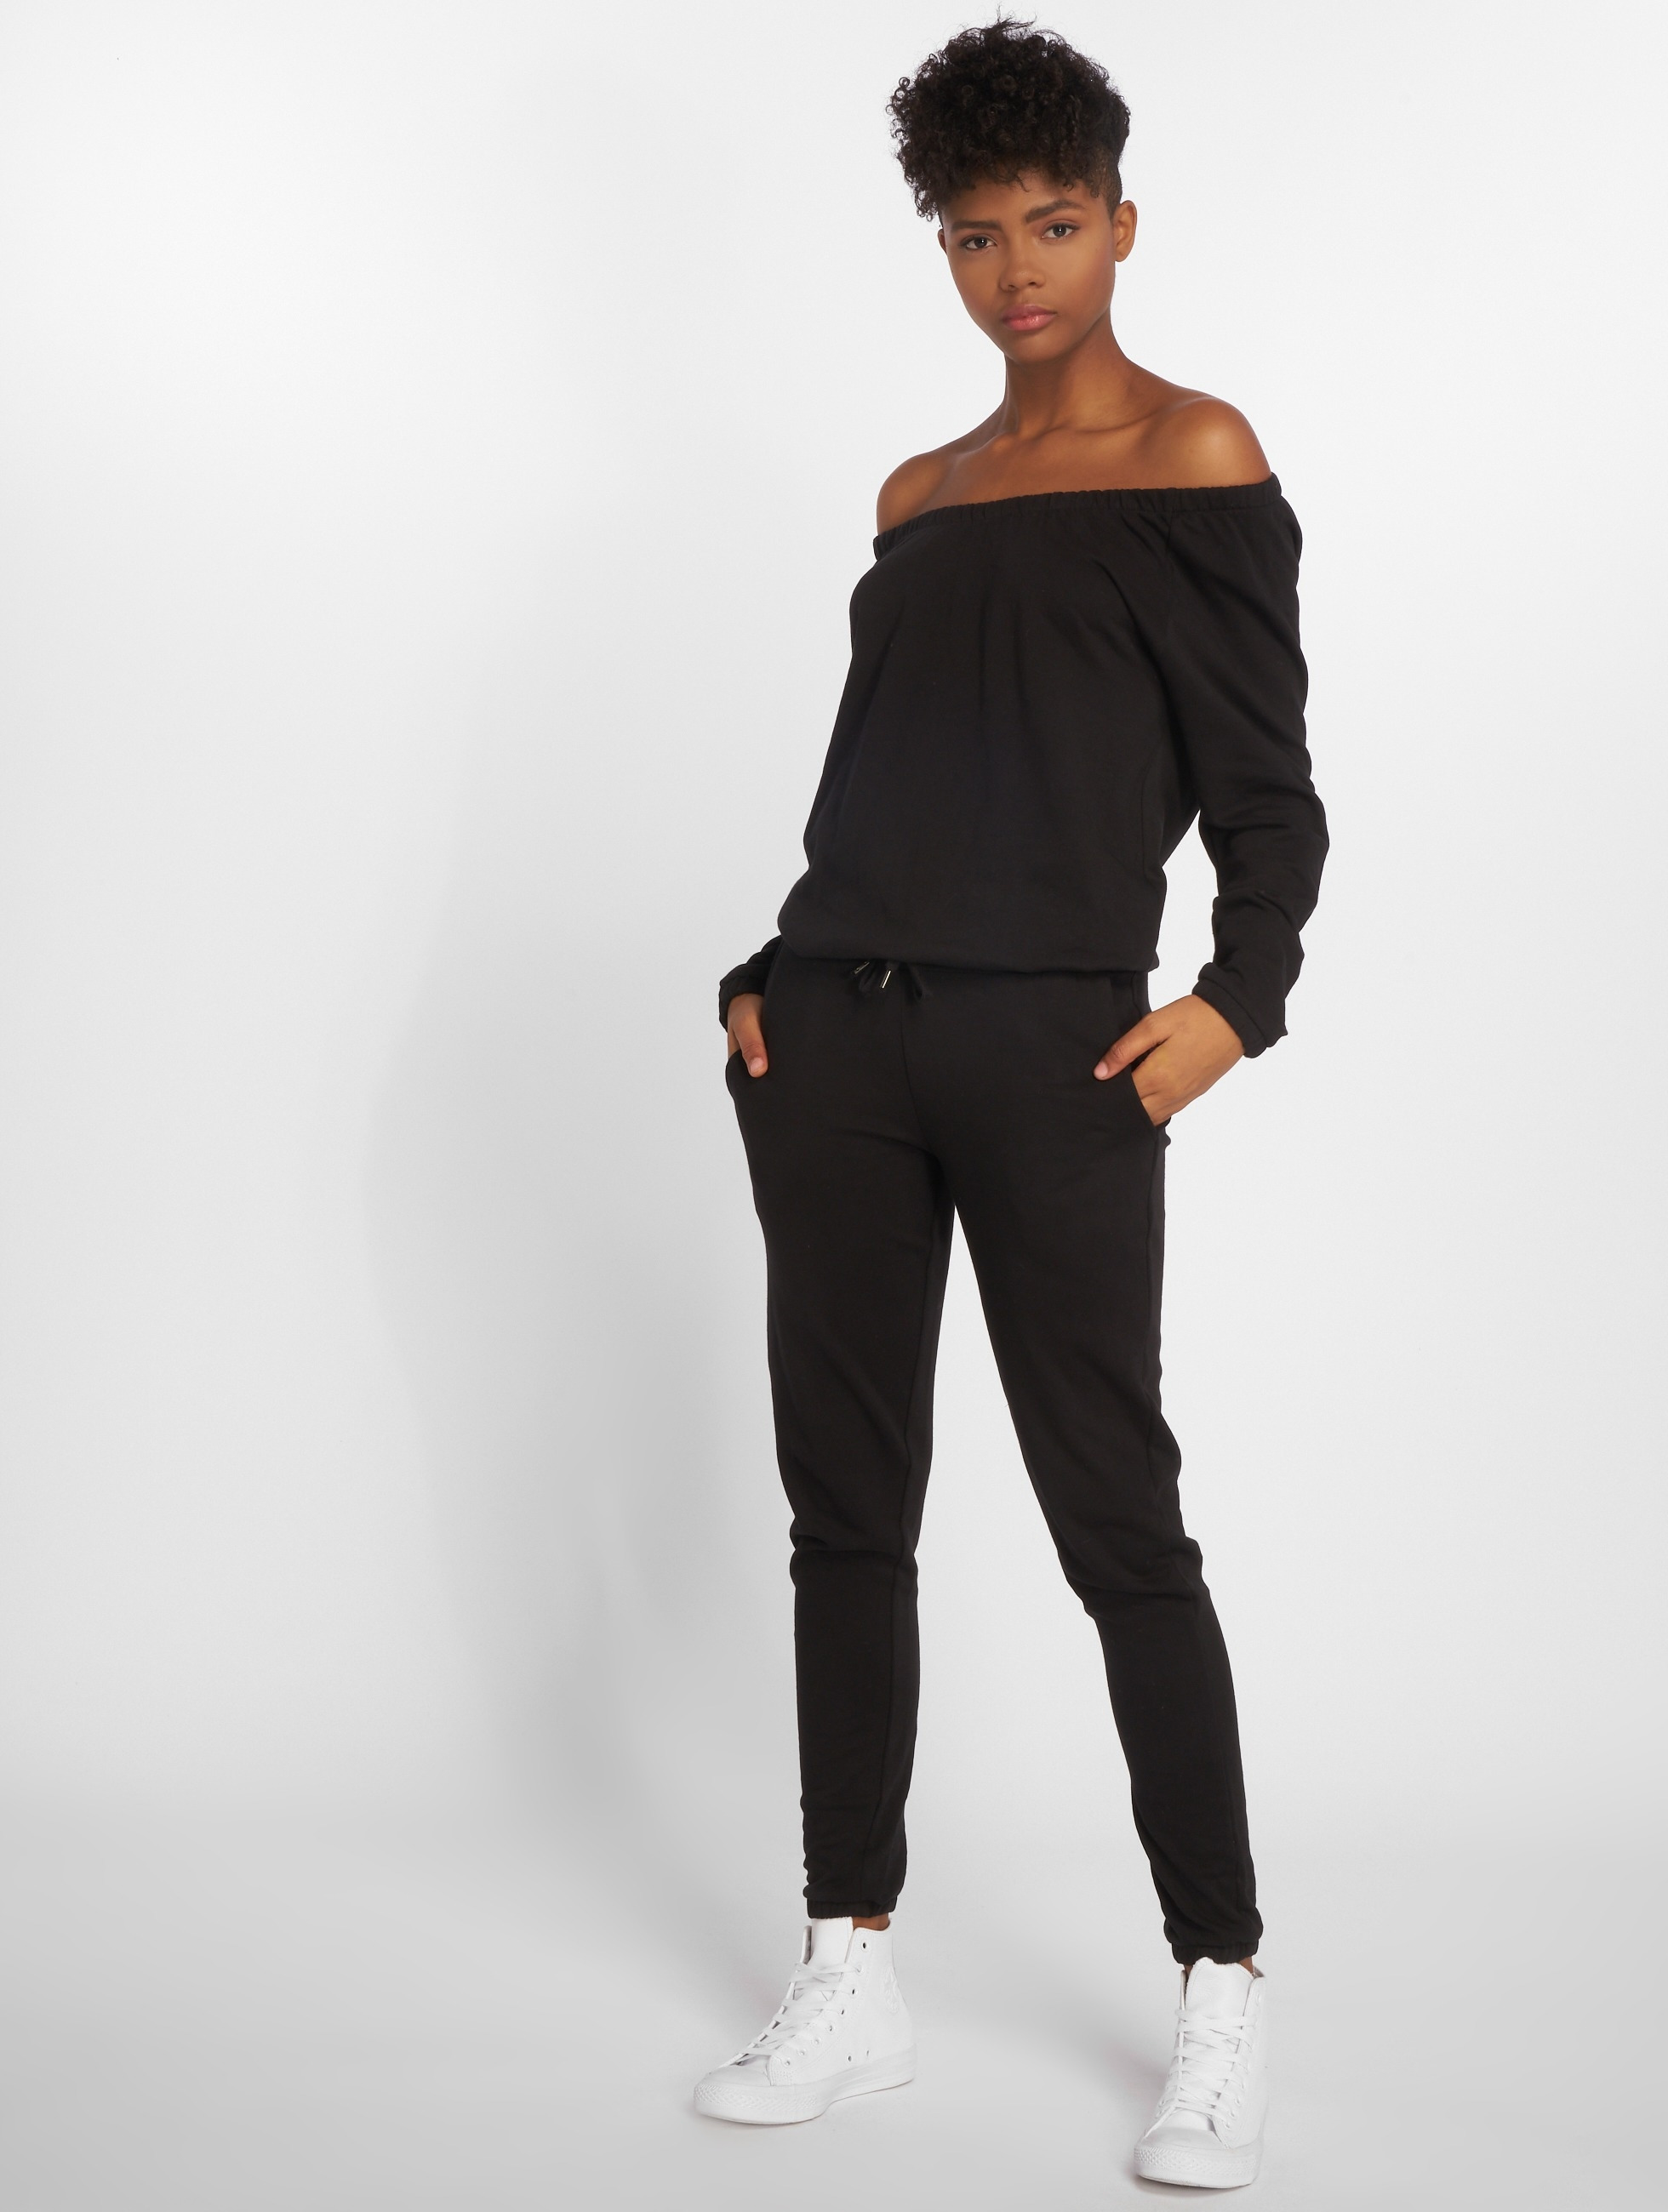 Urban Classics Ladies Long Sleeve Terry Jumpsuit Combinaison Femme